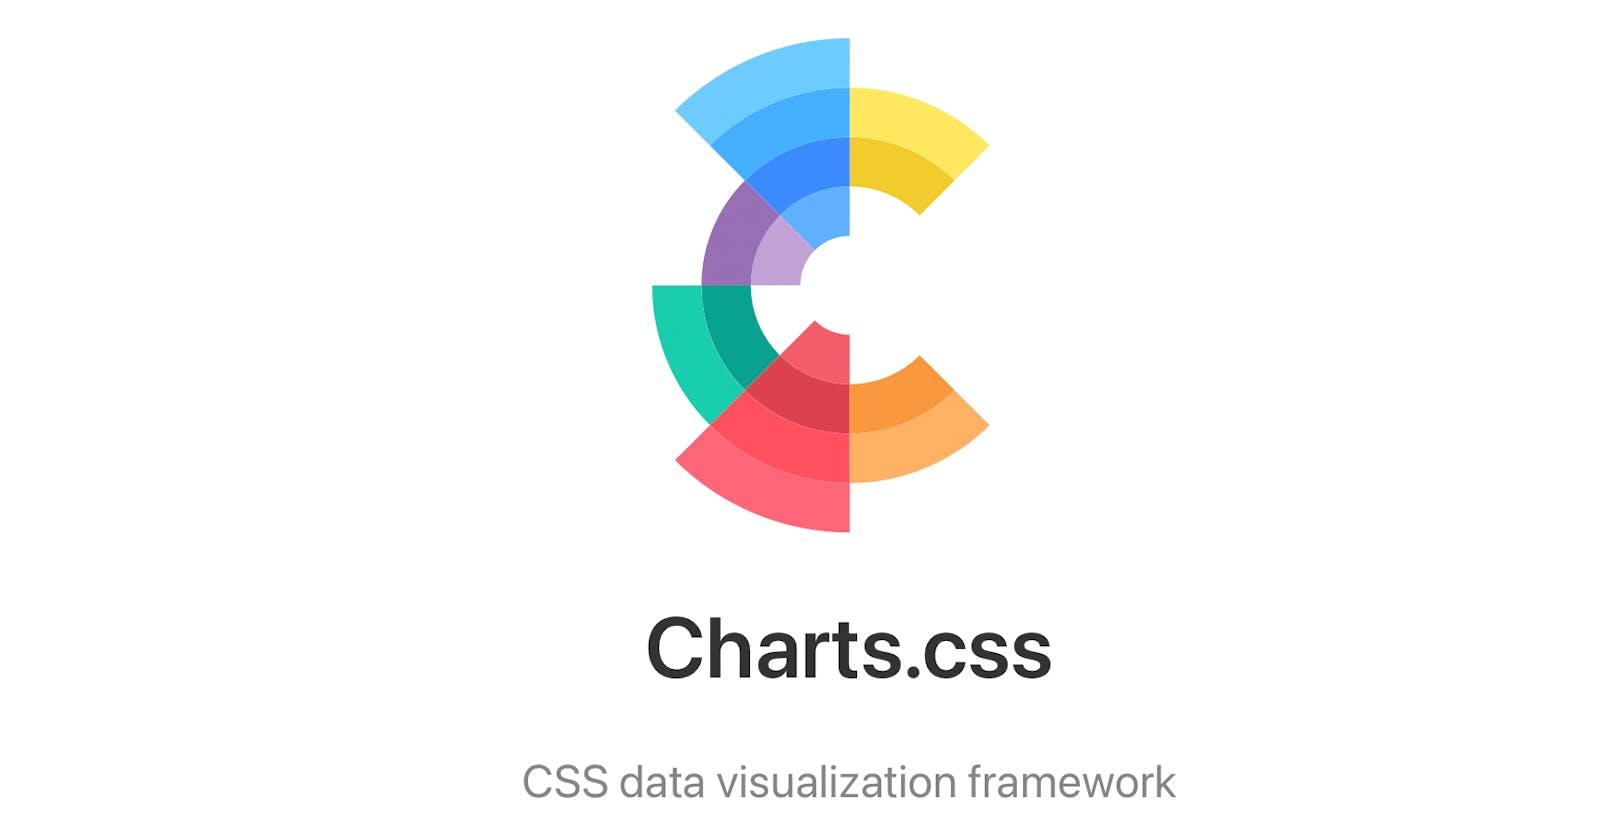 Charts.css new data visualization framework